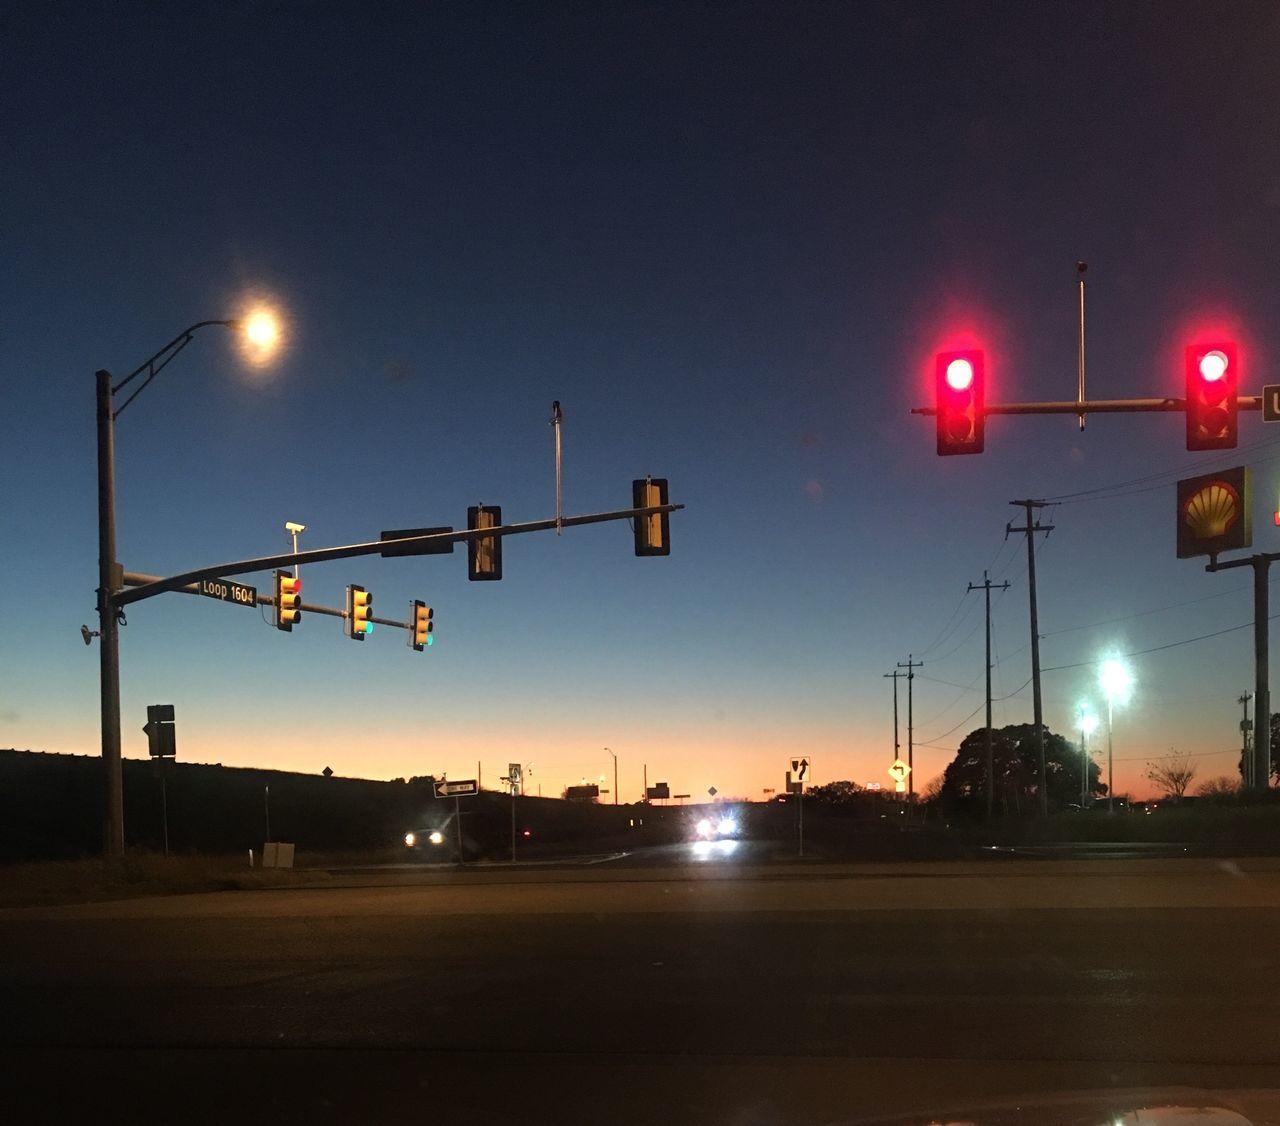 illuminated, night, transportation, red light, stoplight, guidance, lighting equipment, street light, safety, road, no people, outdoors, mode of transport, railway signal, road sign, land vehicle, sky